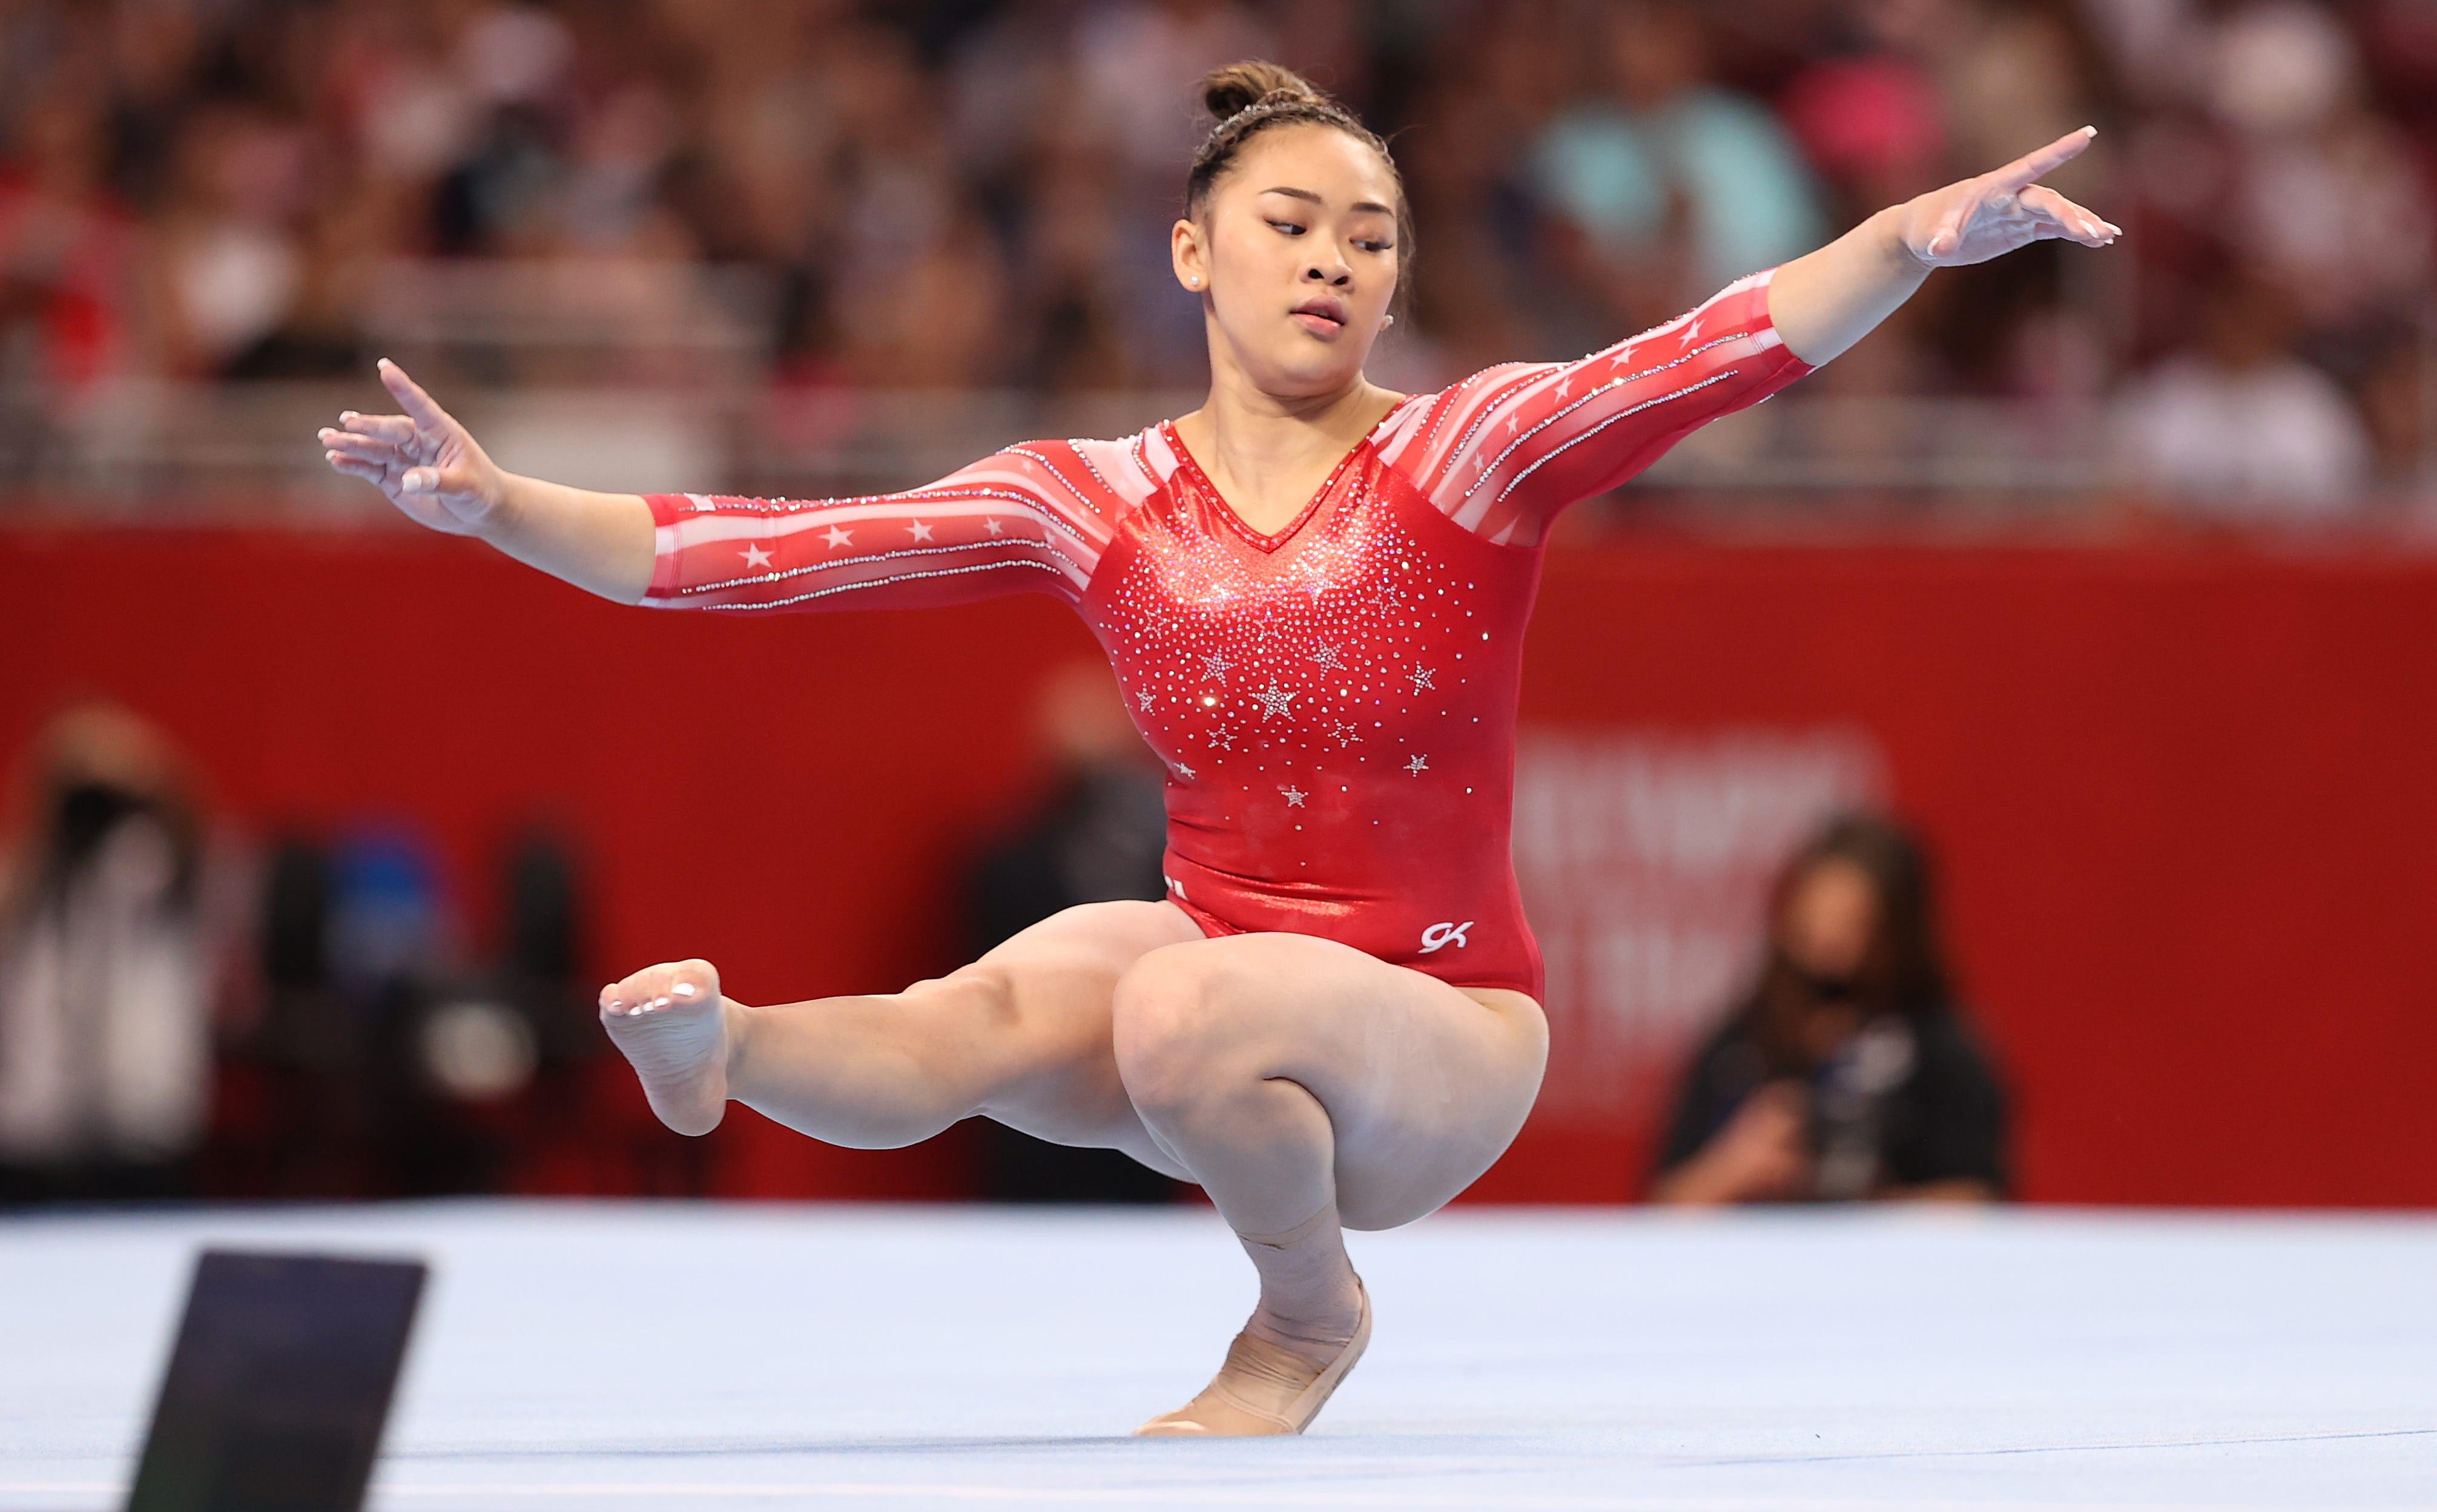 Sunisa Lee punches Olympics ticket with slight edge over Simone Biles